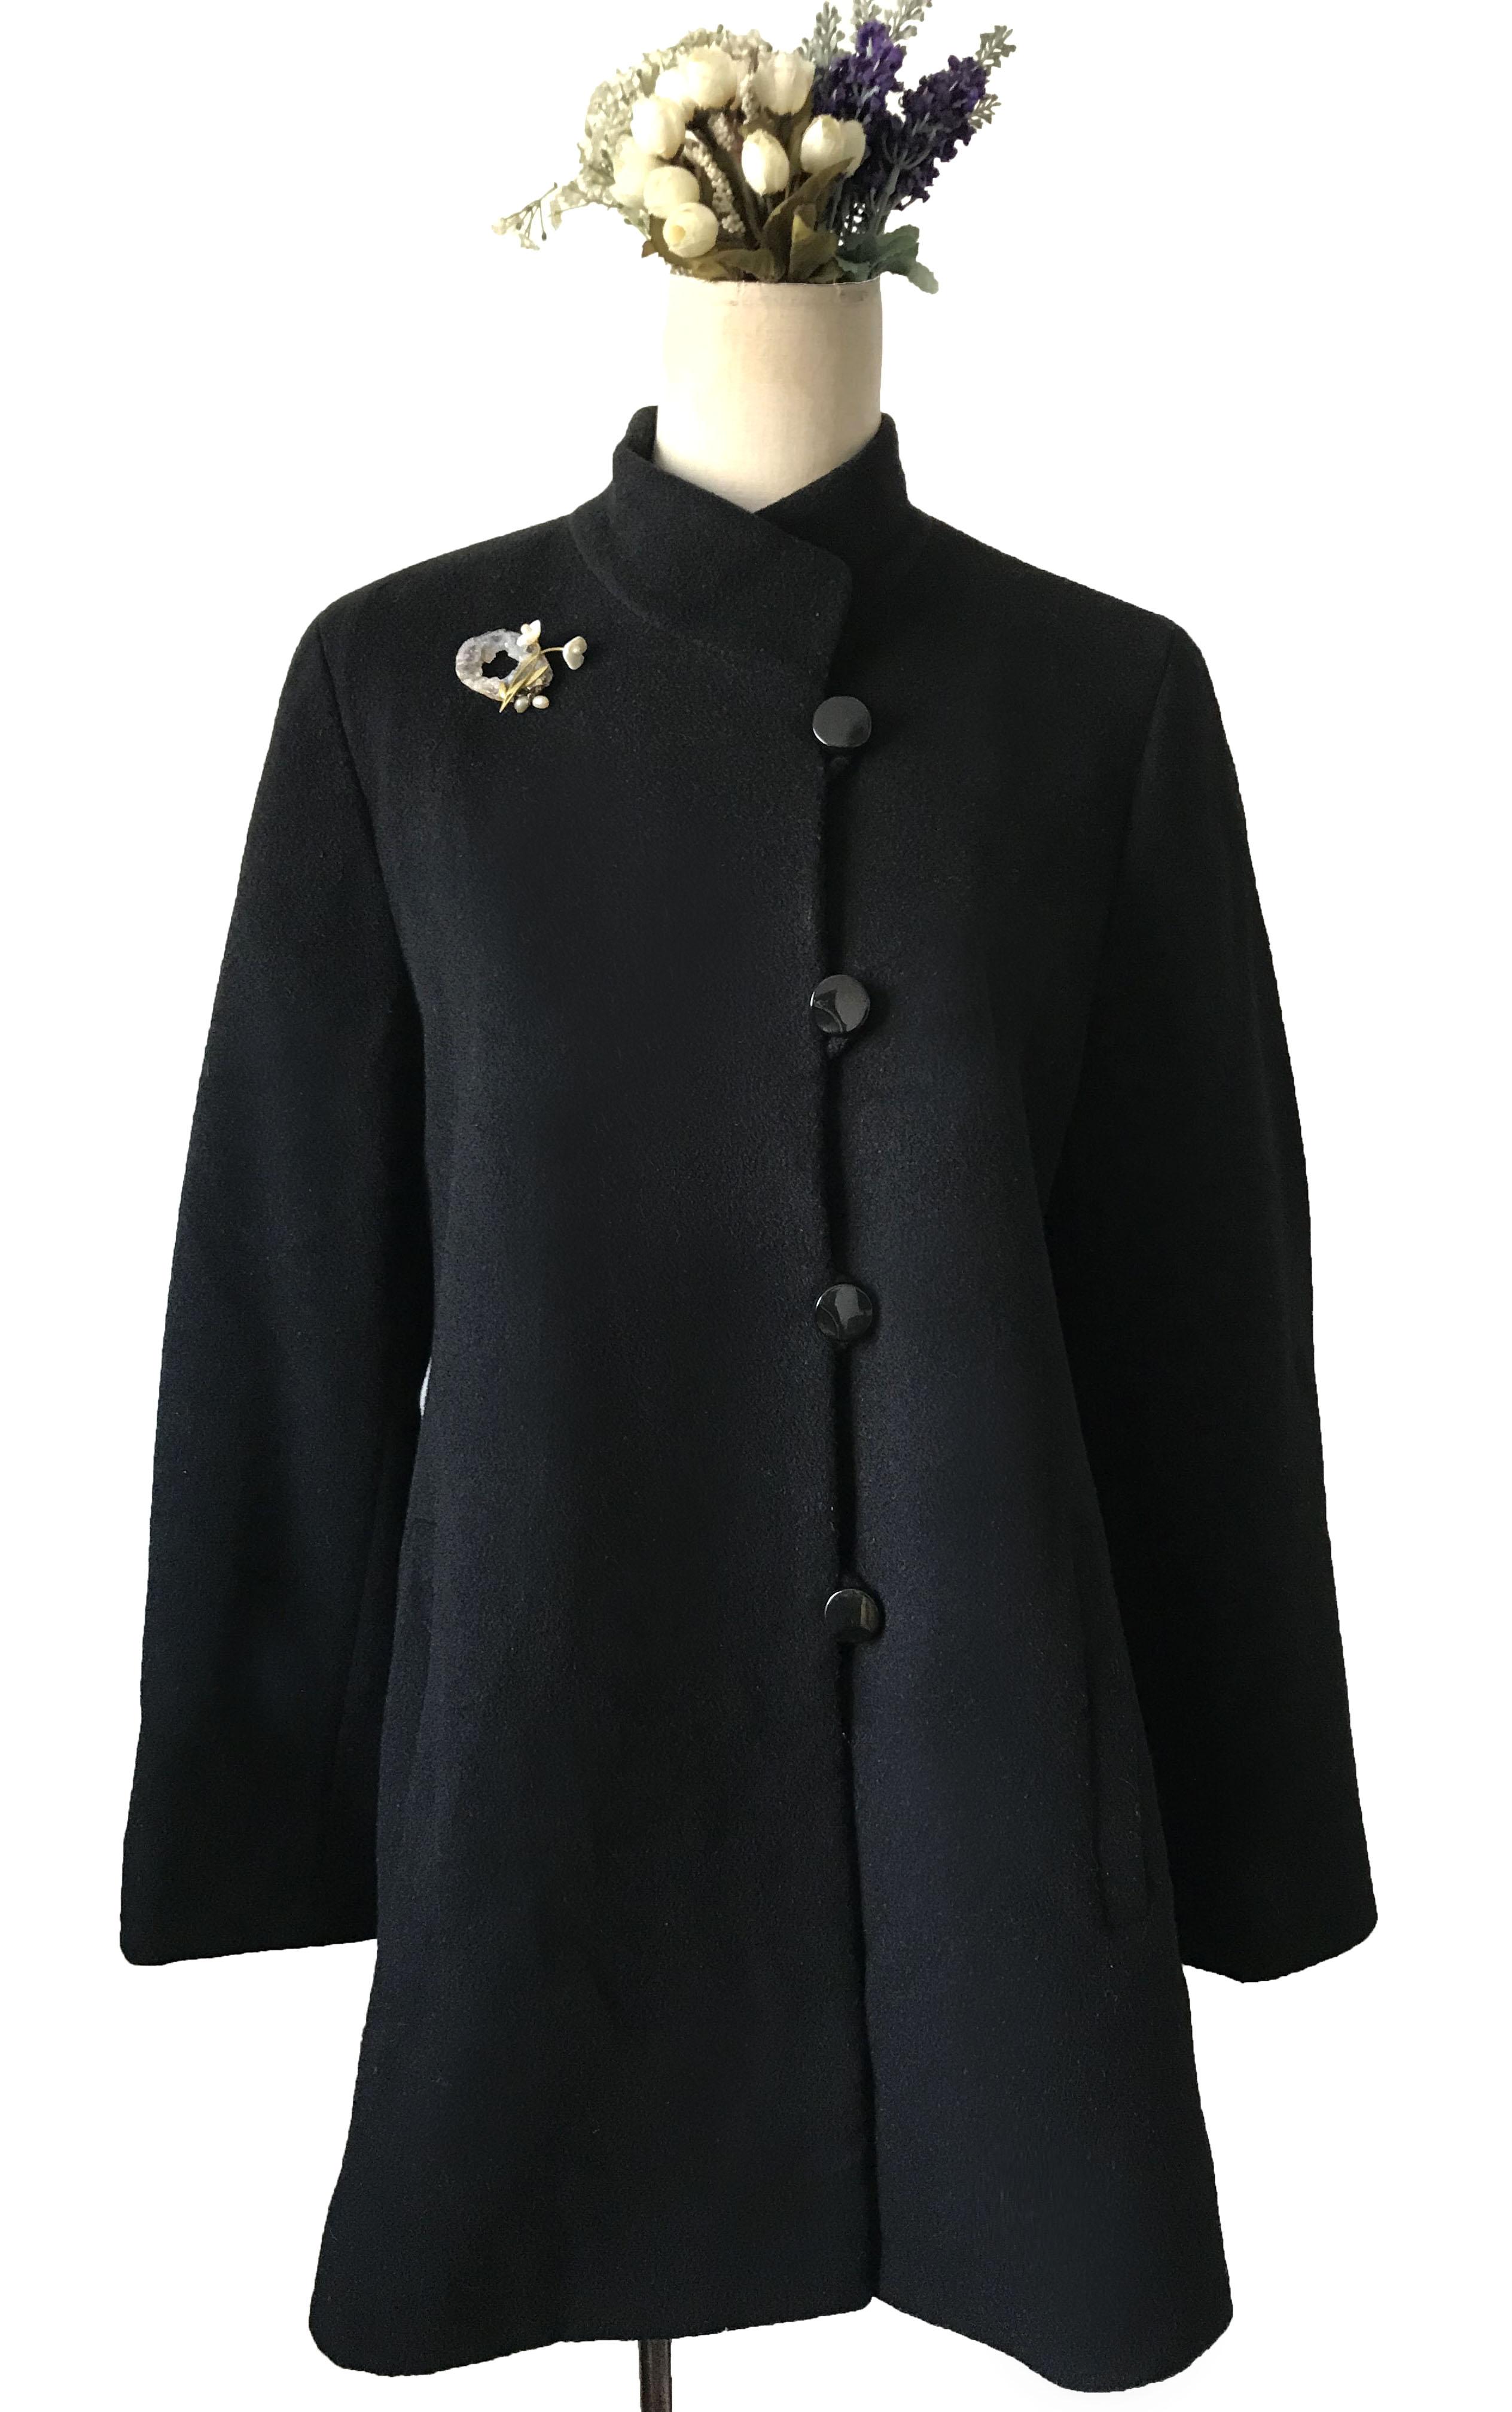 Vintage classic elegant expensive brand temperament black large air field long wool coat boutique recommendation